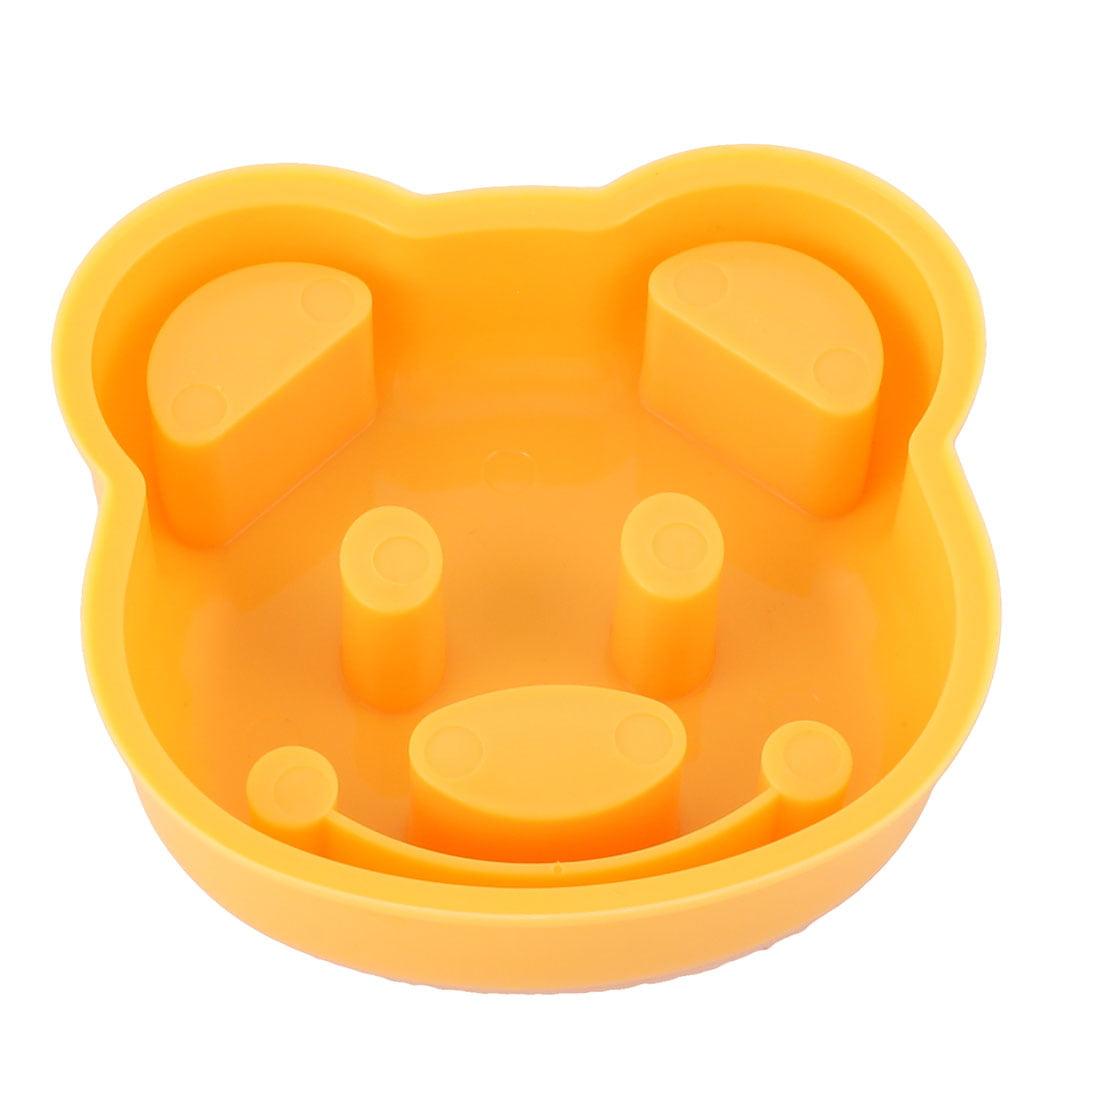 Home Kitchen Plastic Bear Head Shaped DIY Sandwich Bread Rice Ball Mould Orange - image 2 of 3